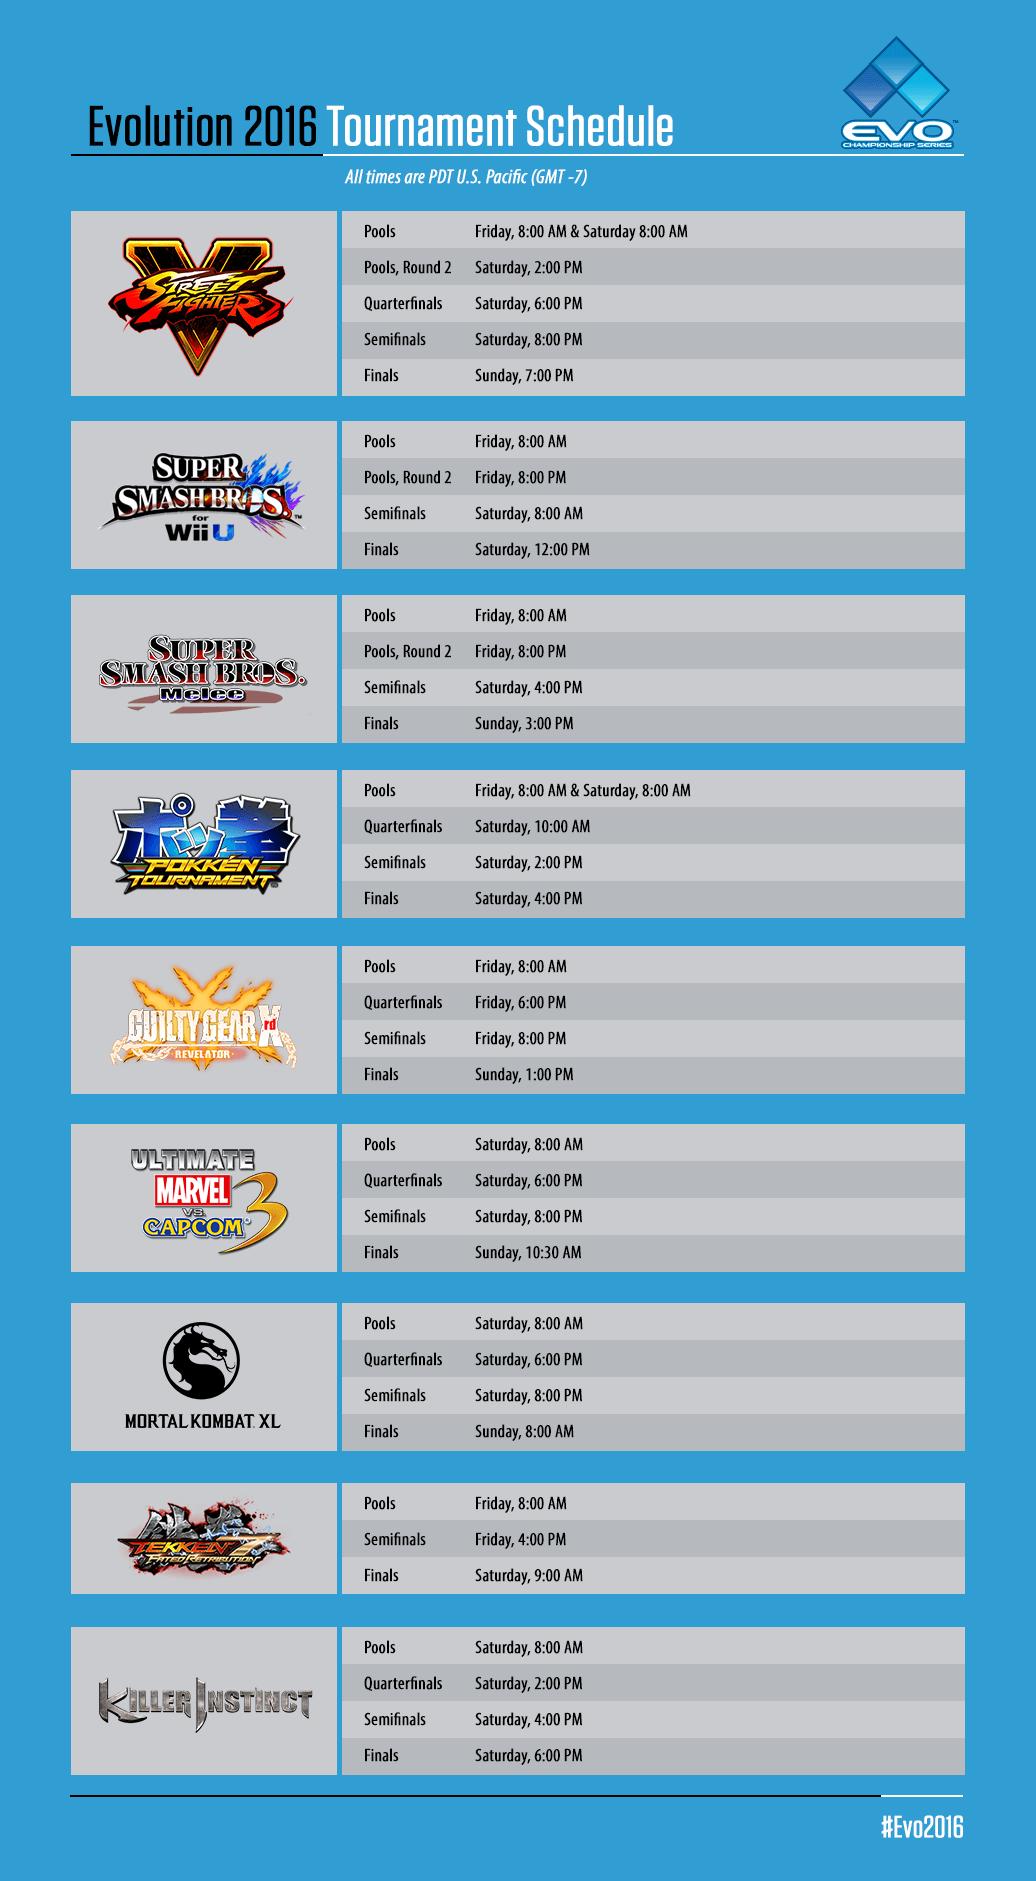 evo_2016_tournament_schedule_1